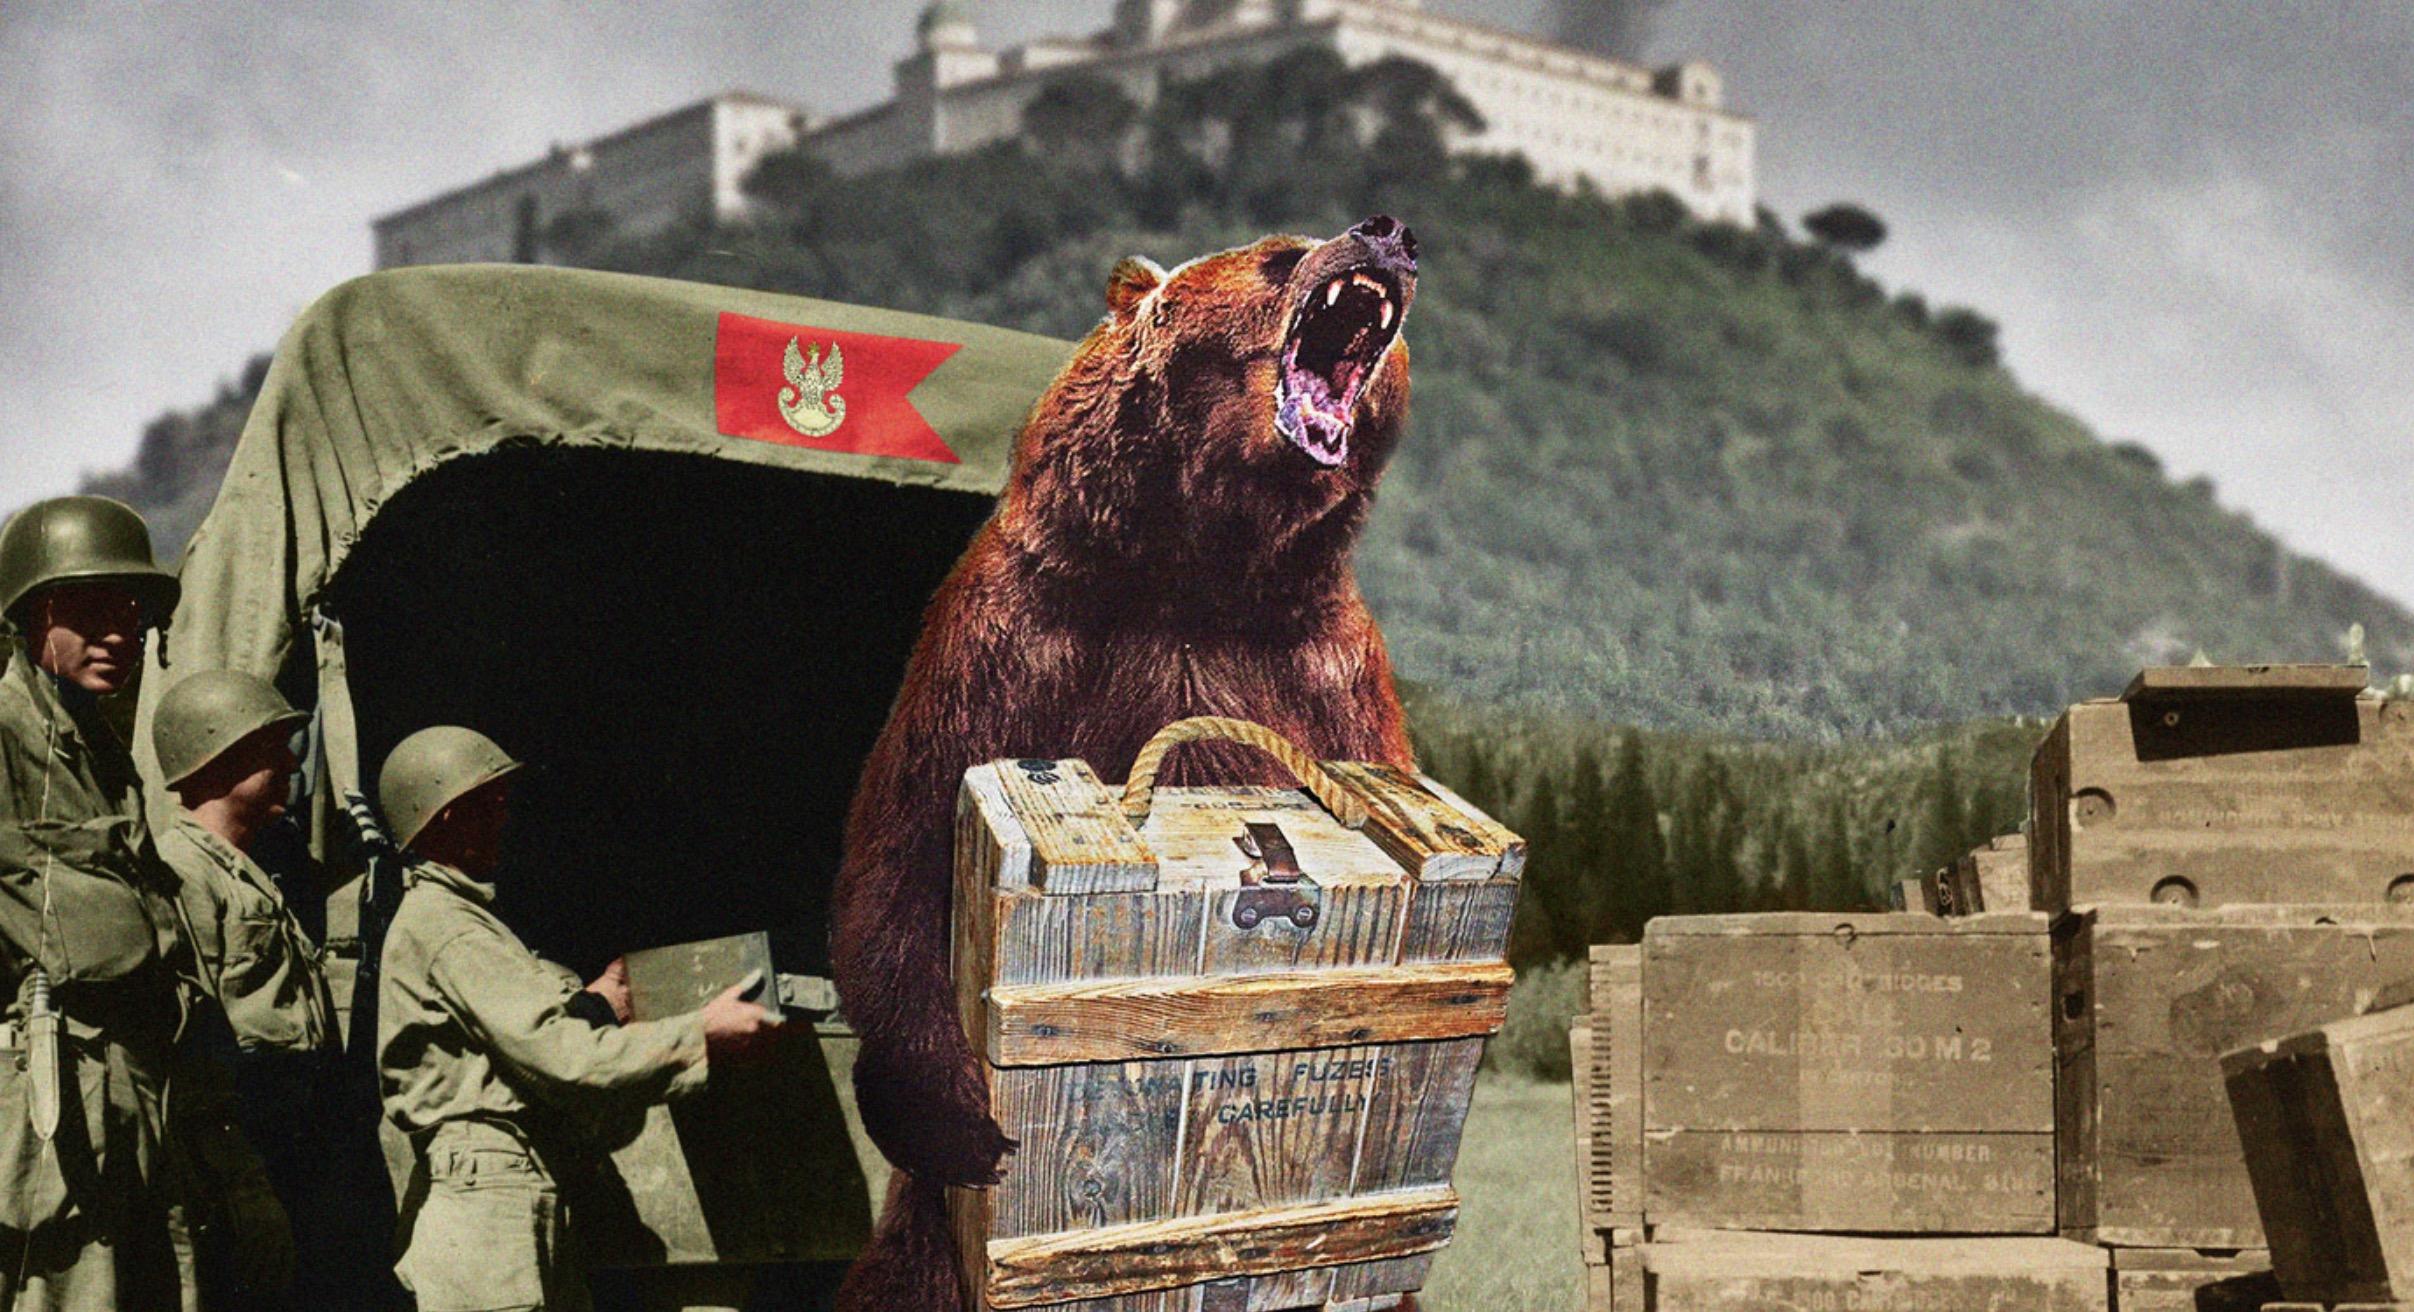 Private Wojtek's Right To Bear Arms